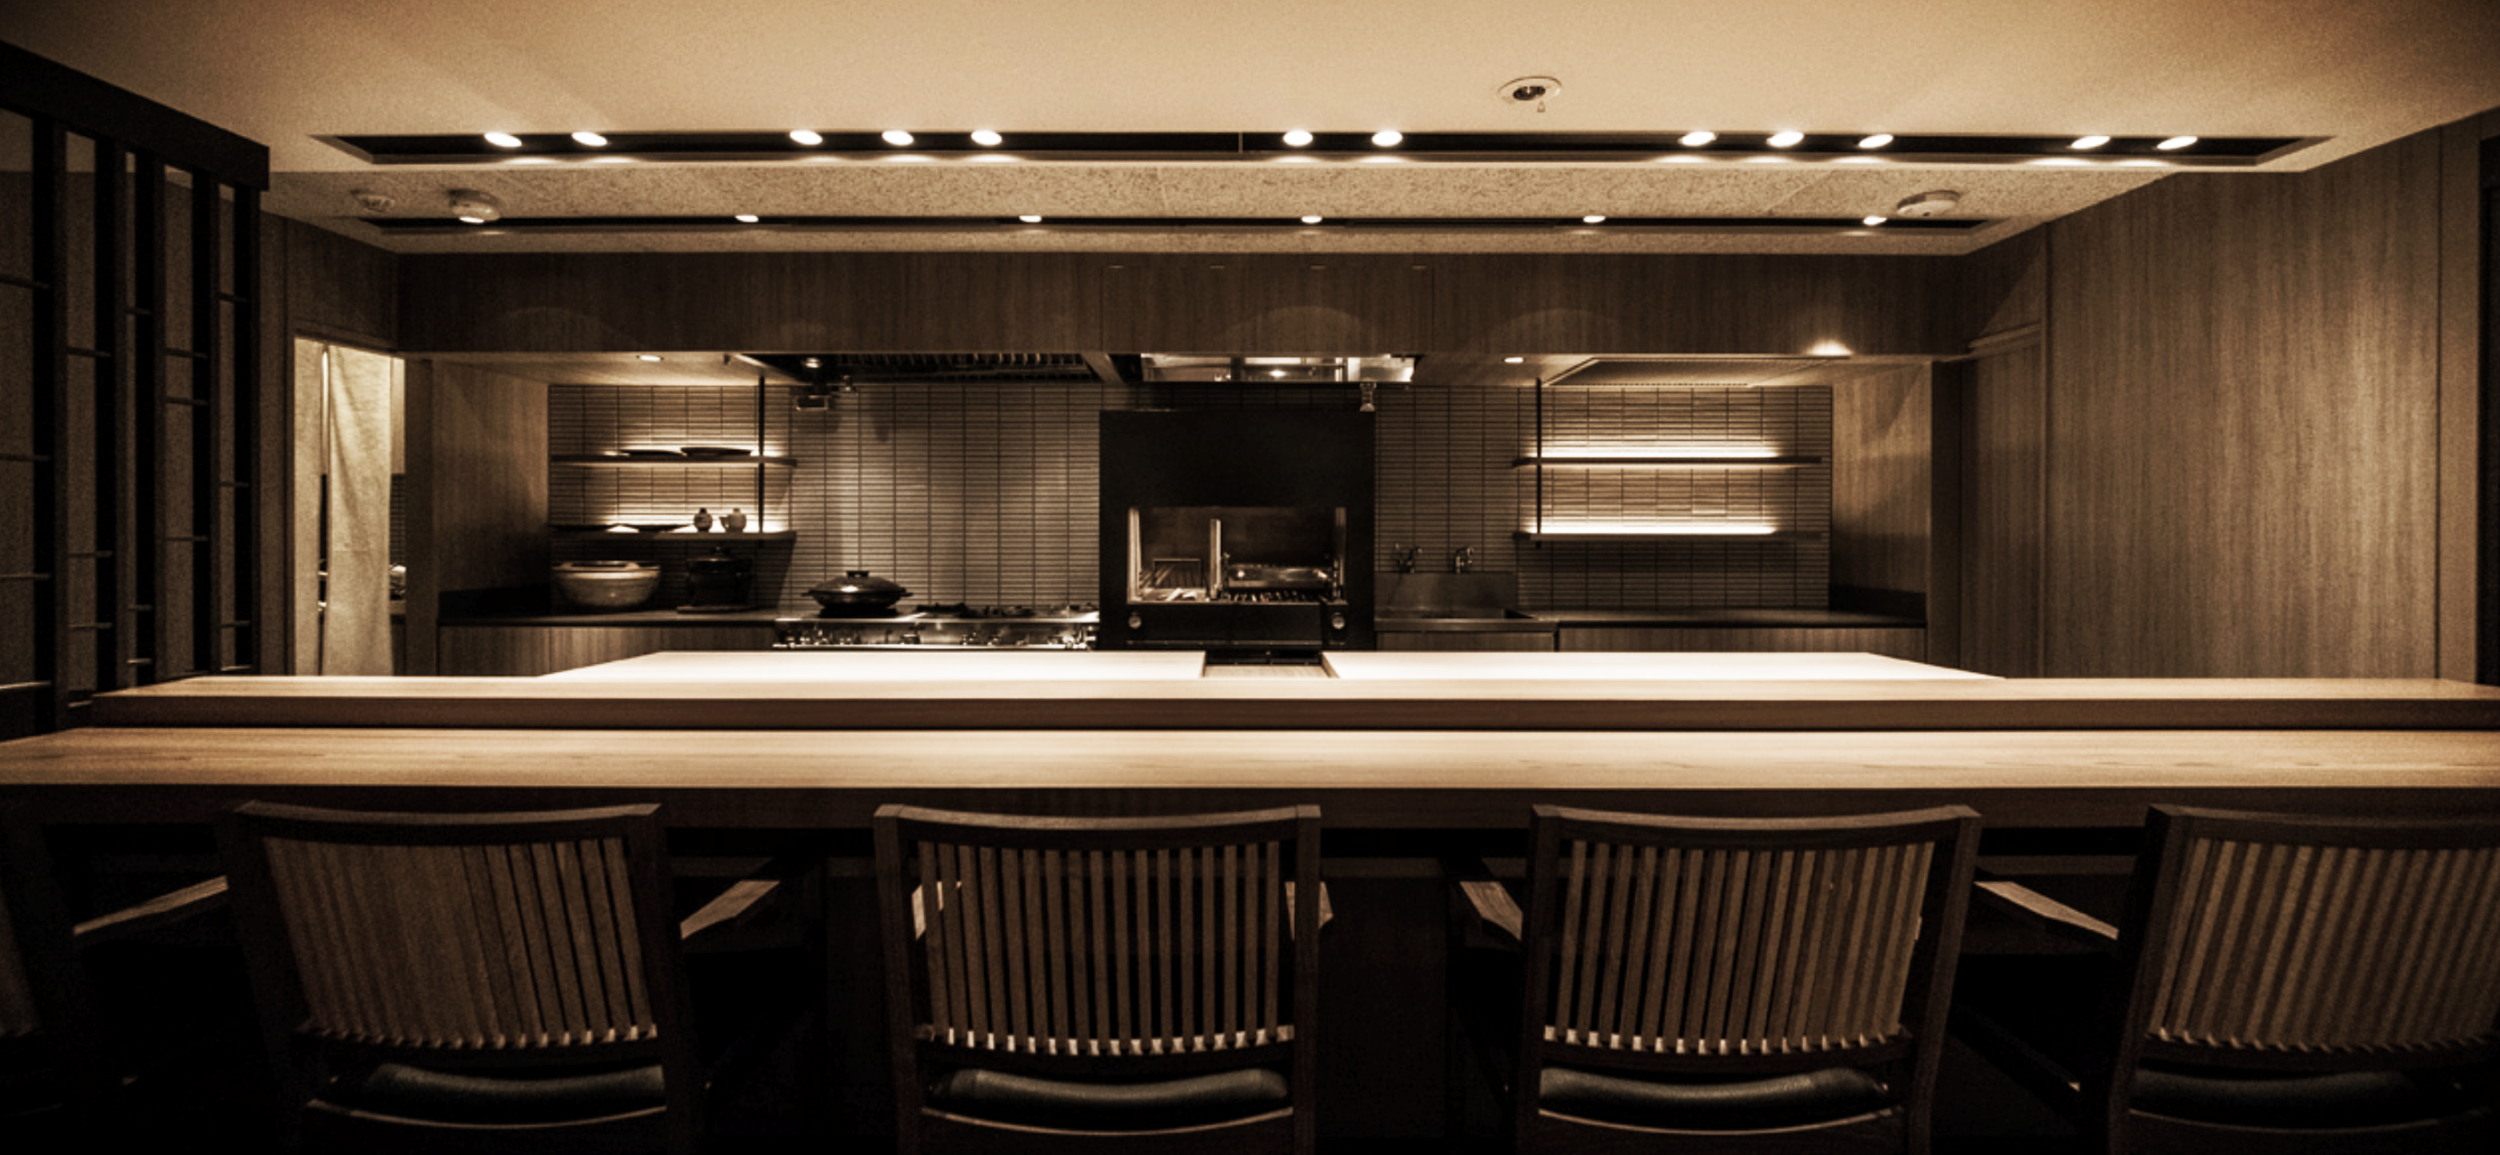 EAT & DRINK_  JO TOKYO.  #Wagyu #Sushi #A5Grade #JoTokyo  http://jo-tokyo.jp